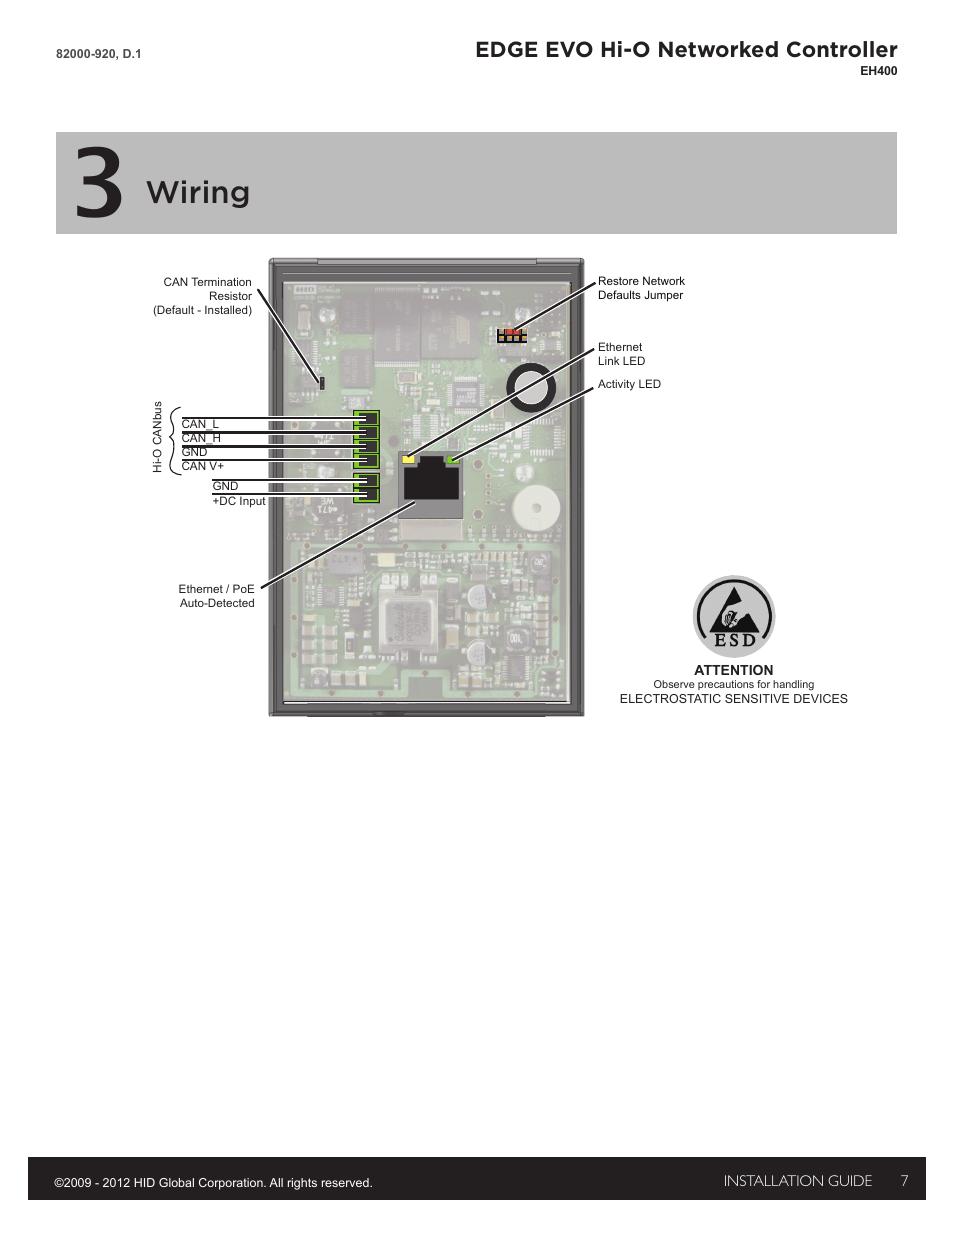 medium resolution of 3 wiring wiring edge evo hi o networked controller hid edge3 wiring wiring